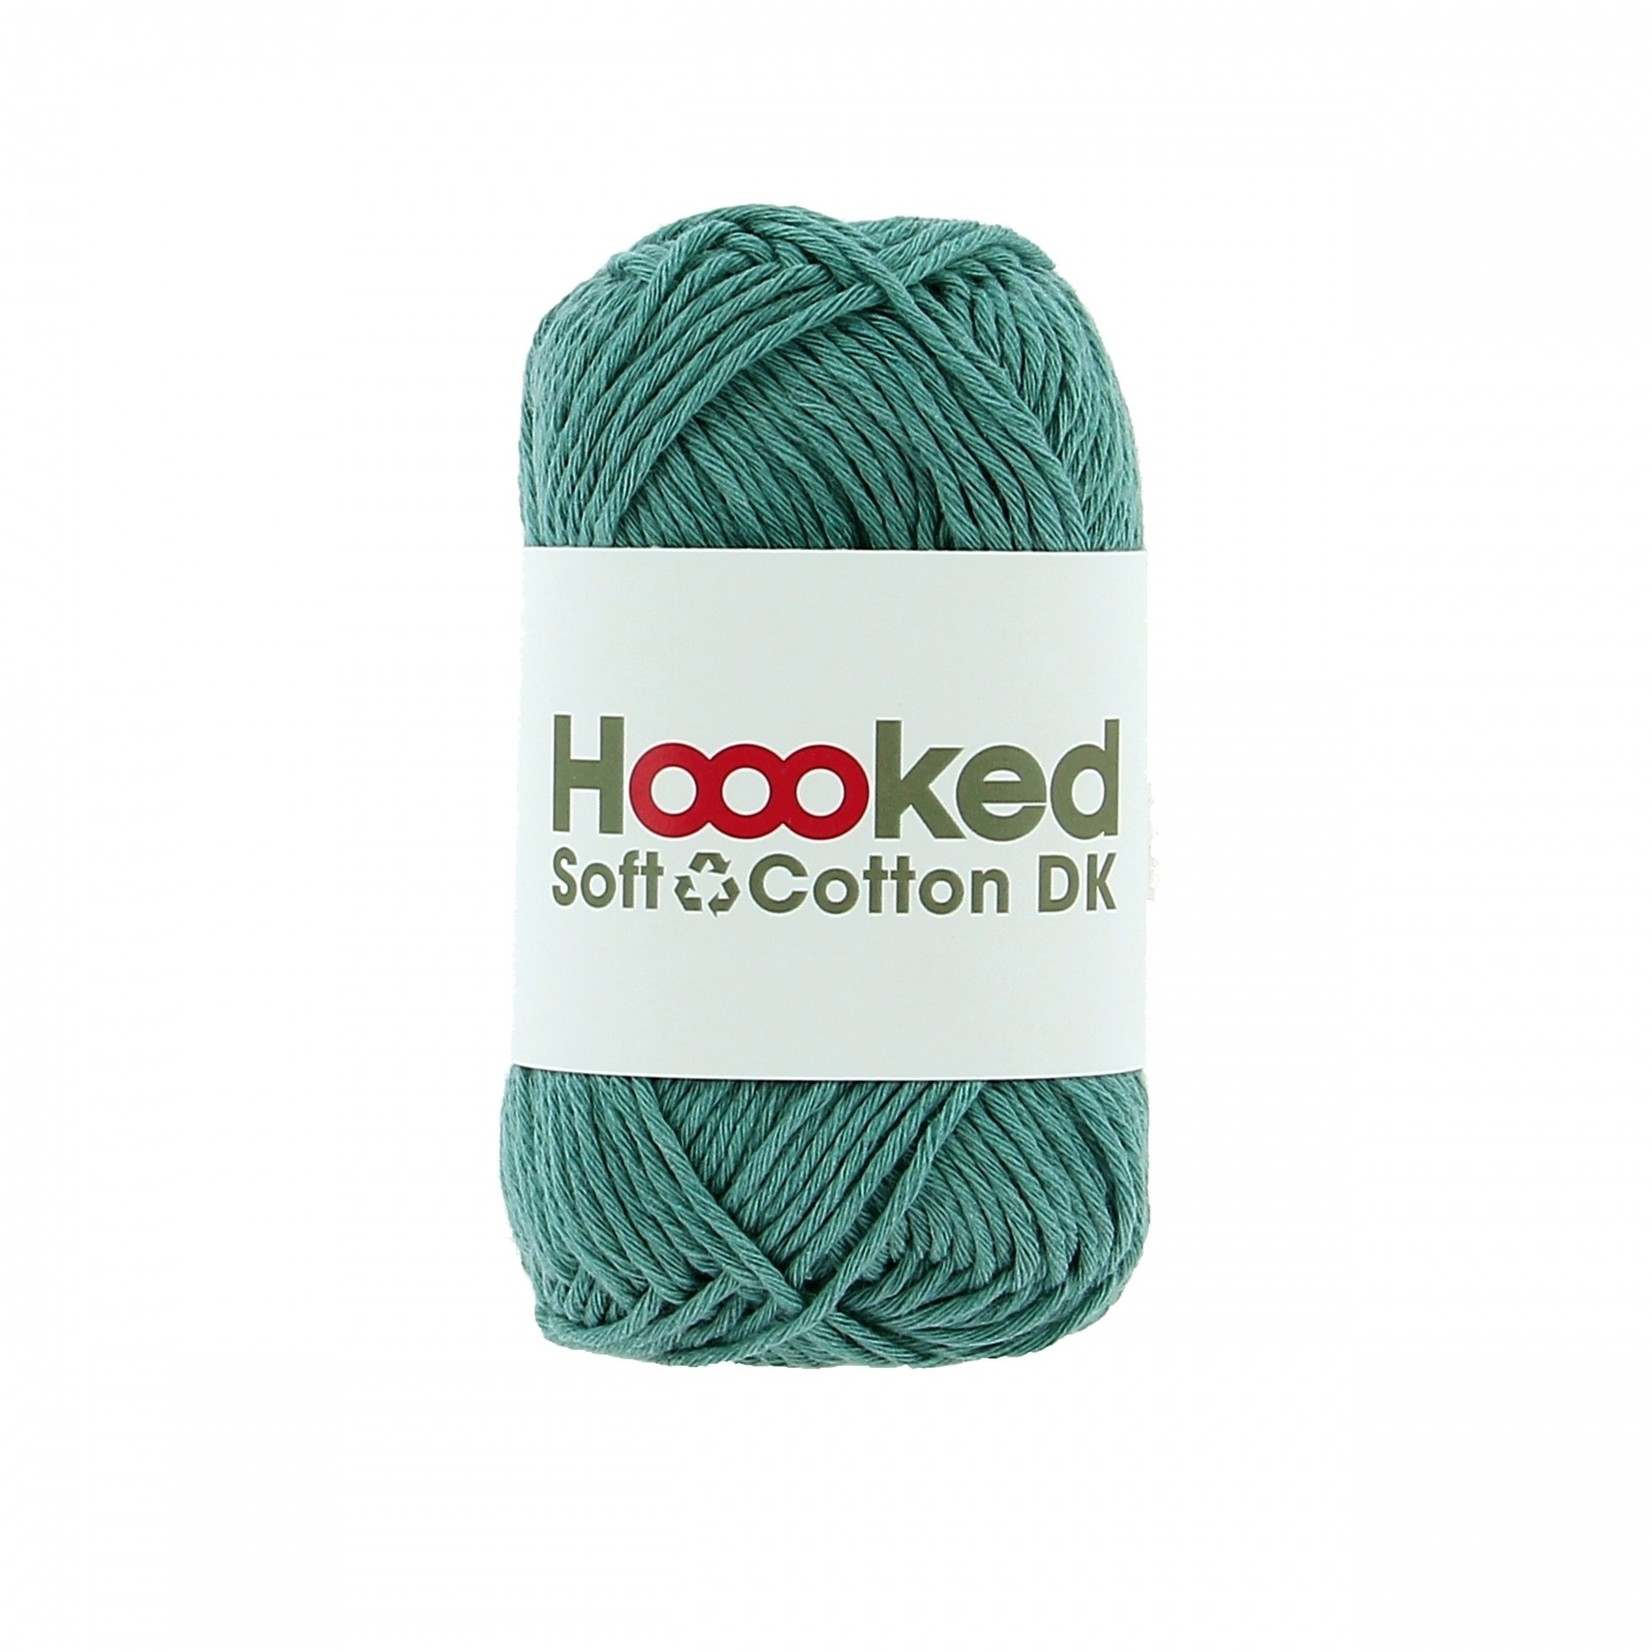 Hoooked Hoooked Soft Cotton DK Oslo Fern 50 gr. / 85 m.